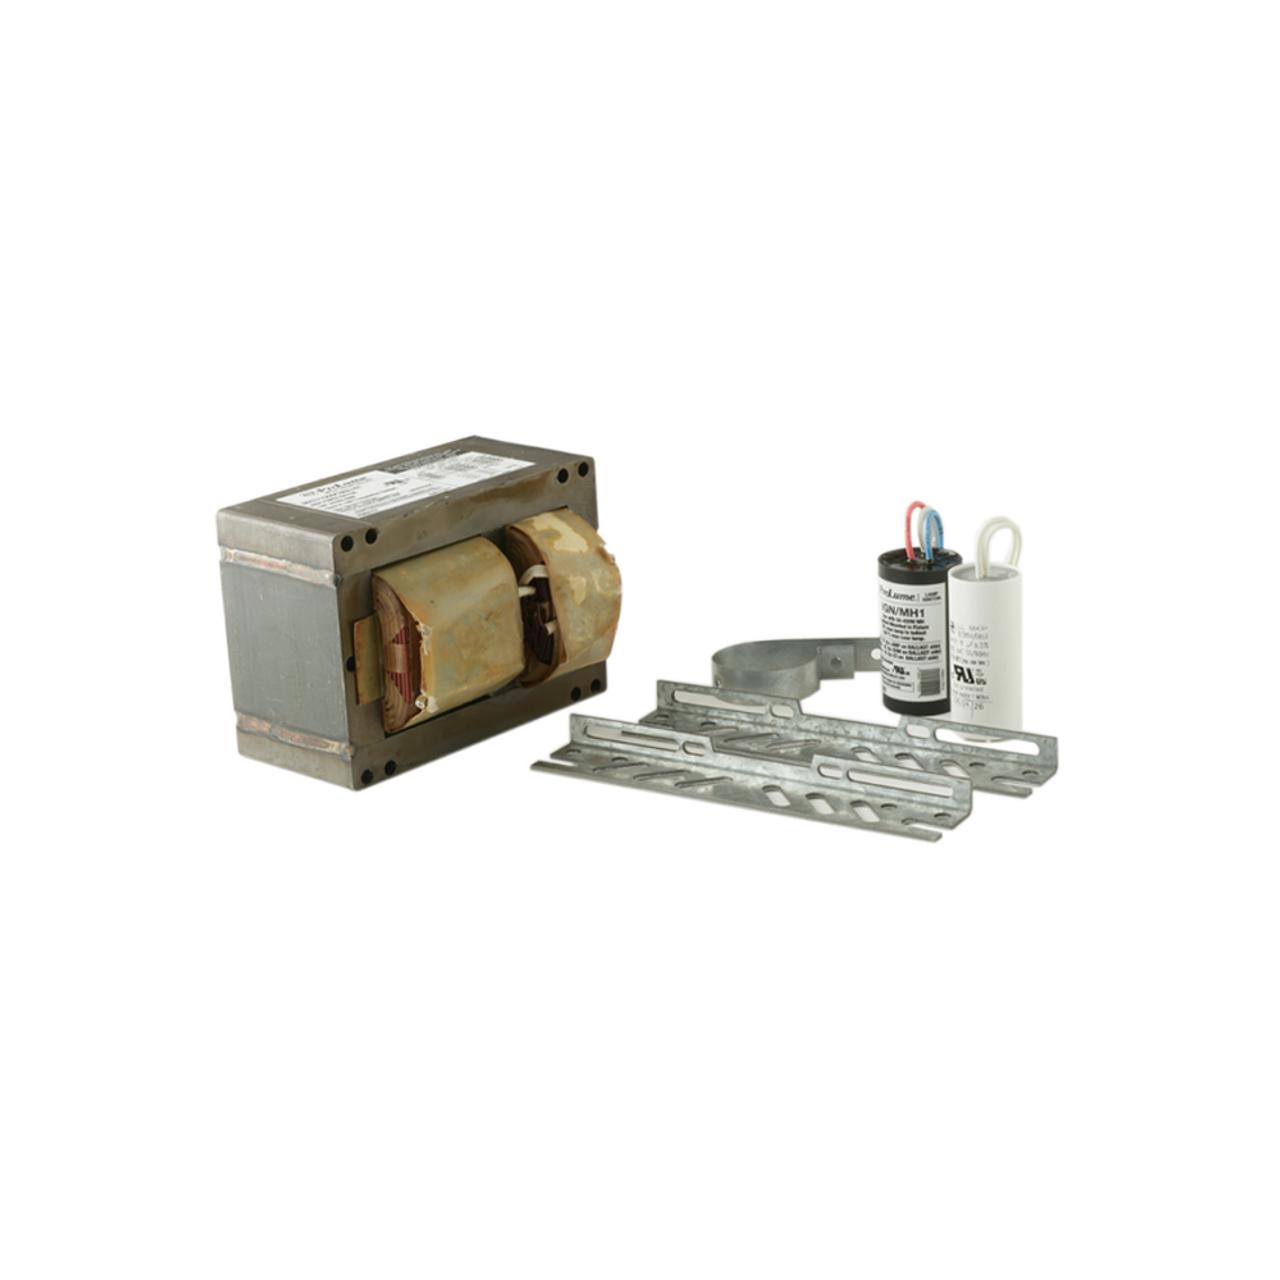 Halco M110//50HX//4T//K 55192 50W Metal Halide Ballast 4-Tap Pulse Start 120-277V